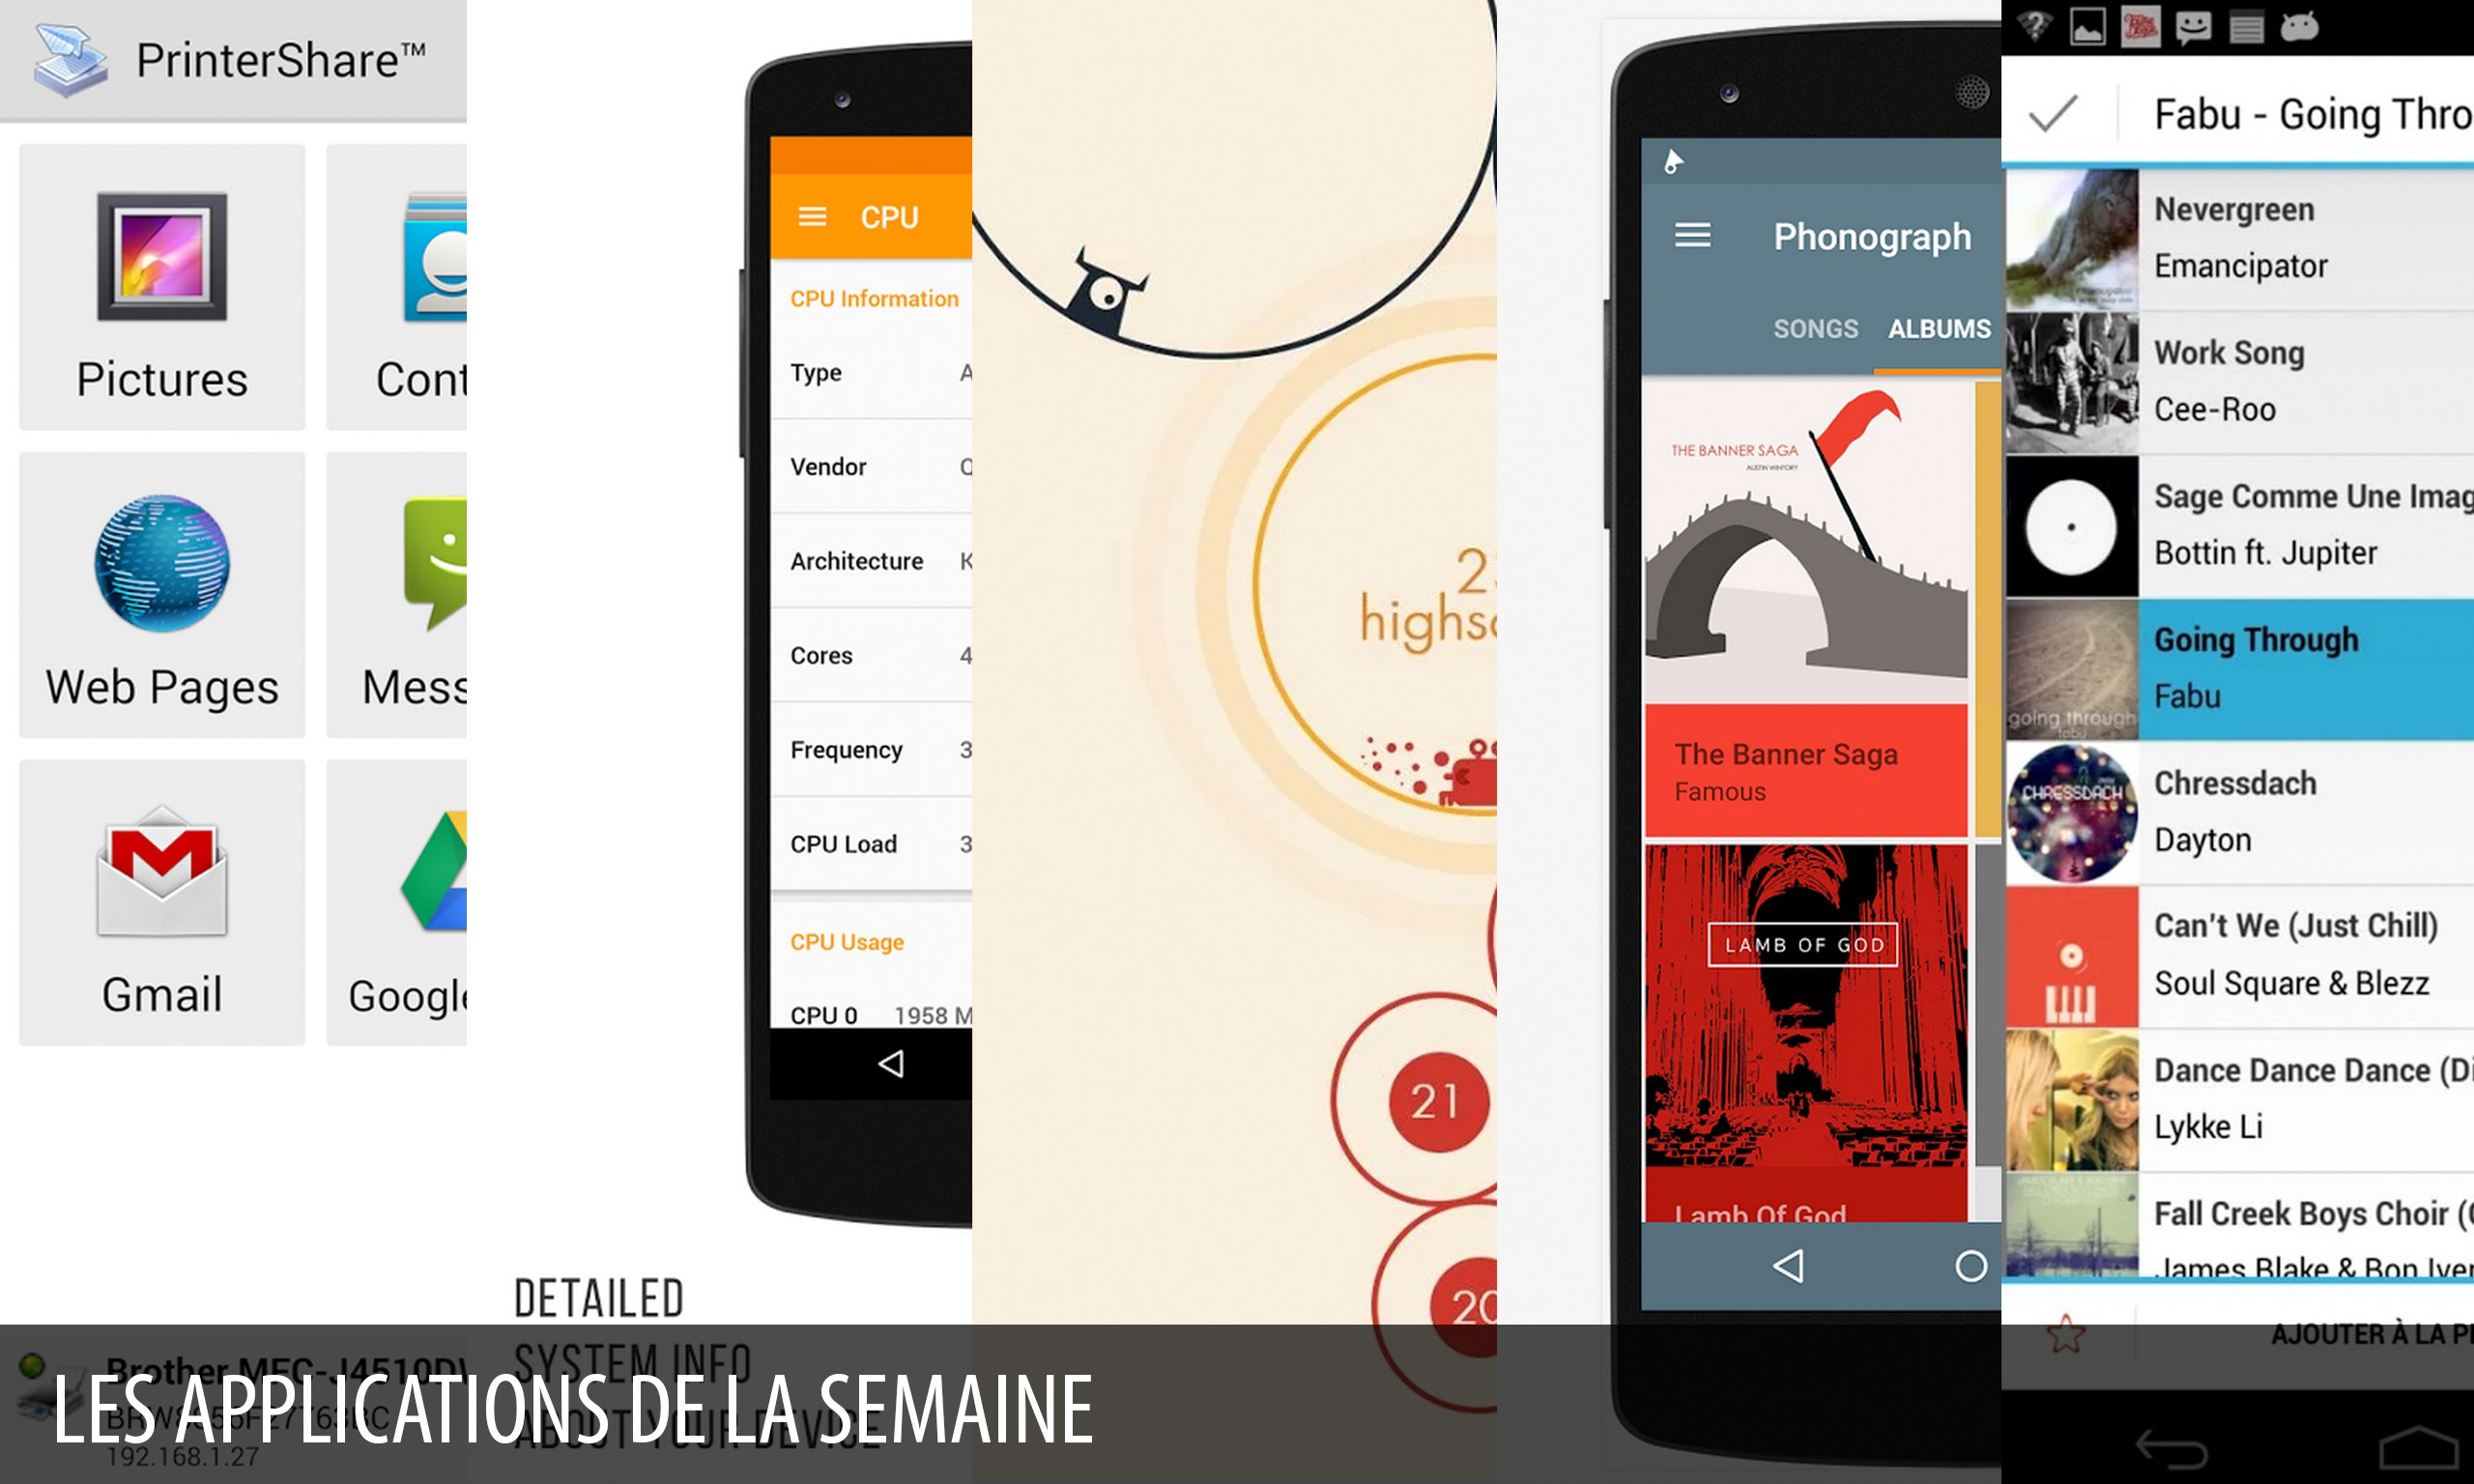 Les apps de la semaine : PrinterShare™ Mobile Print, Castro,…